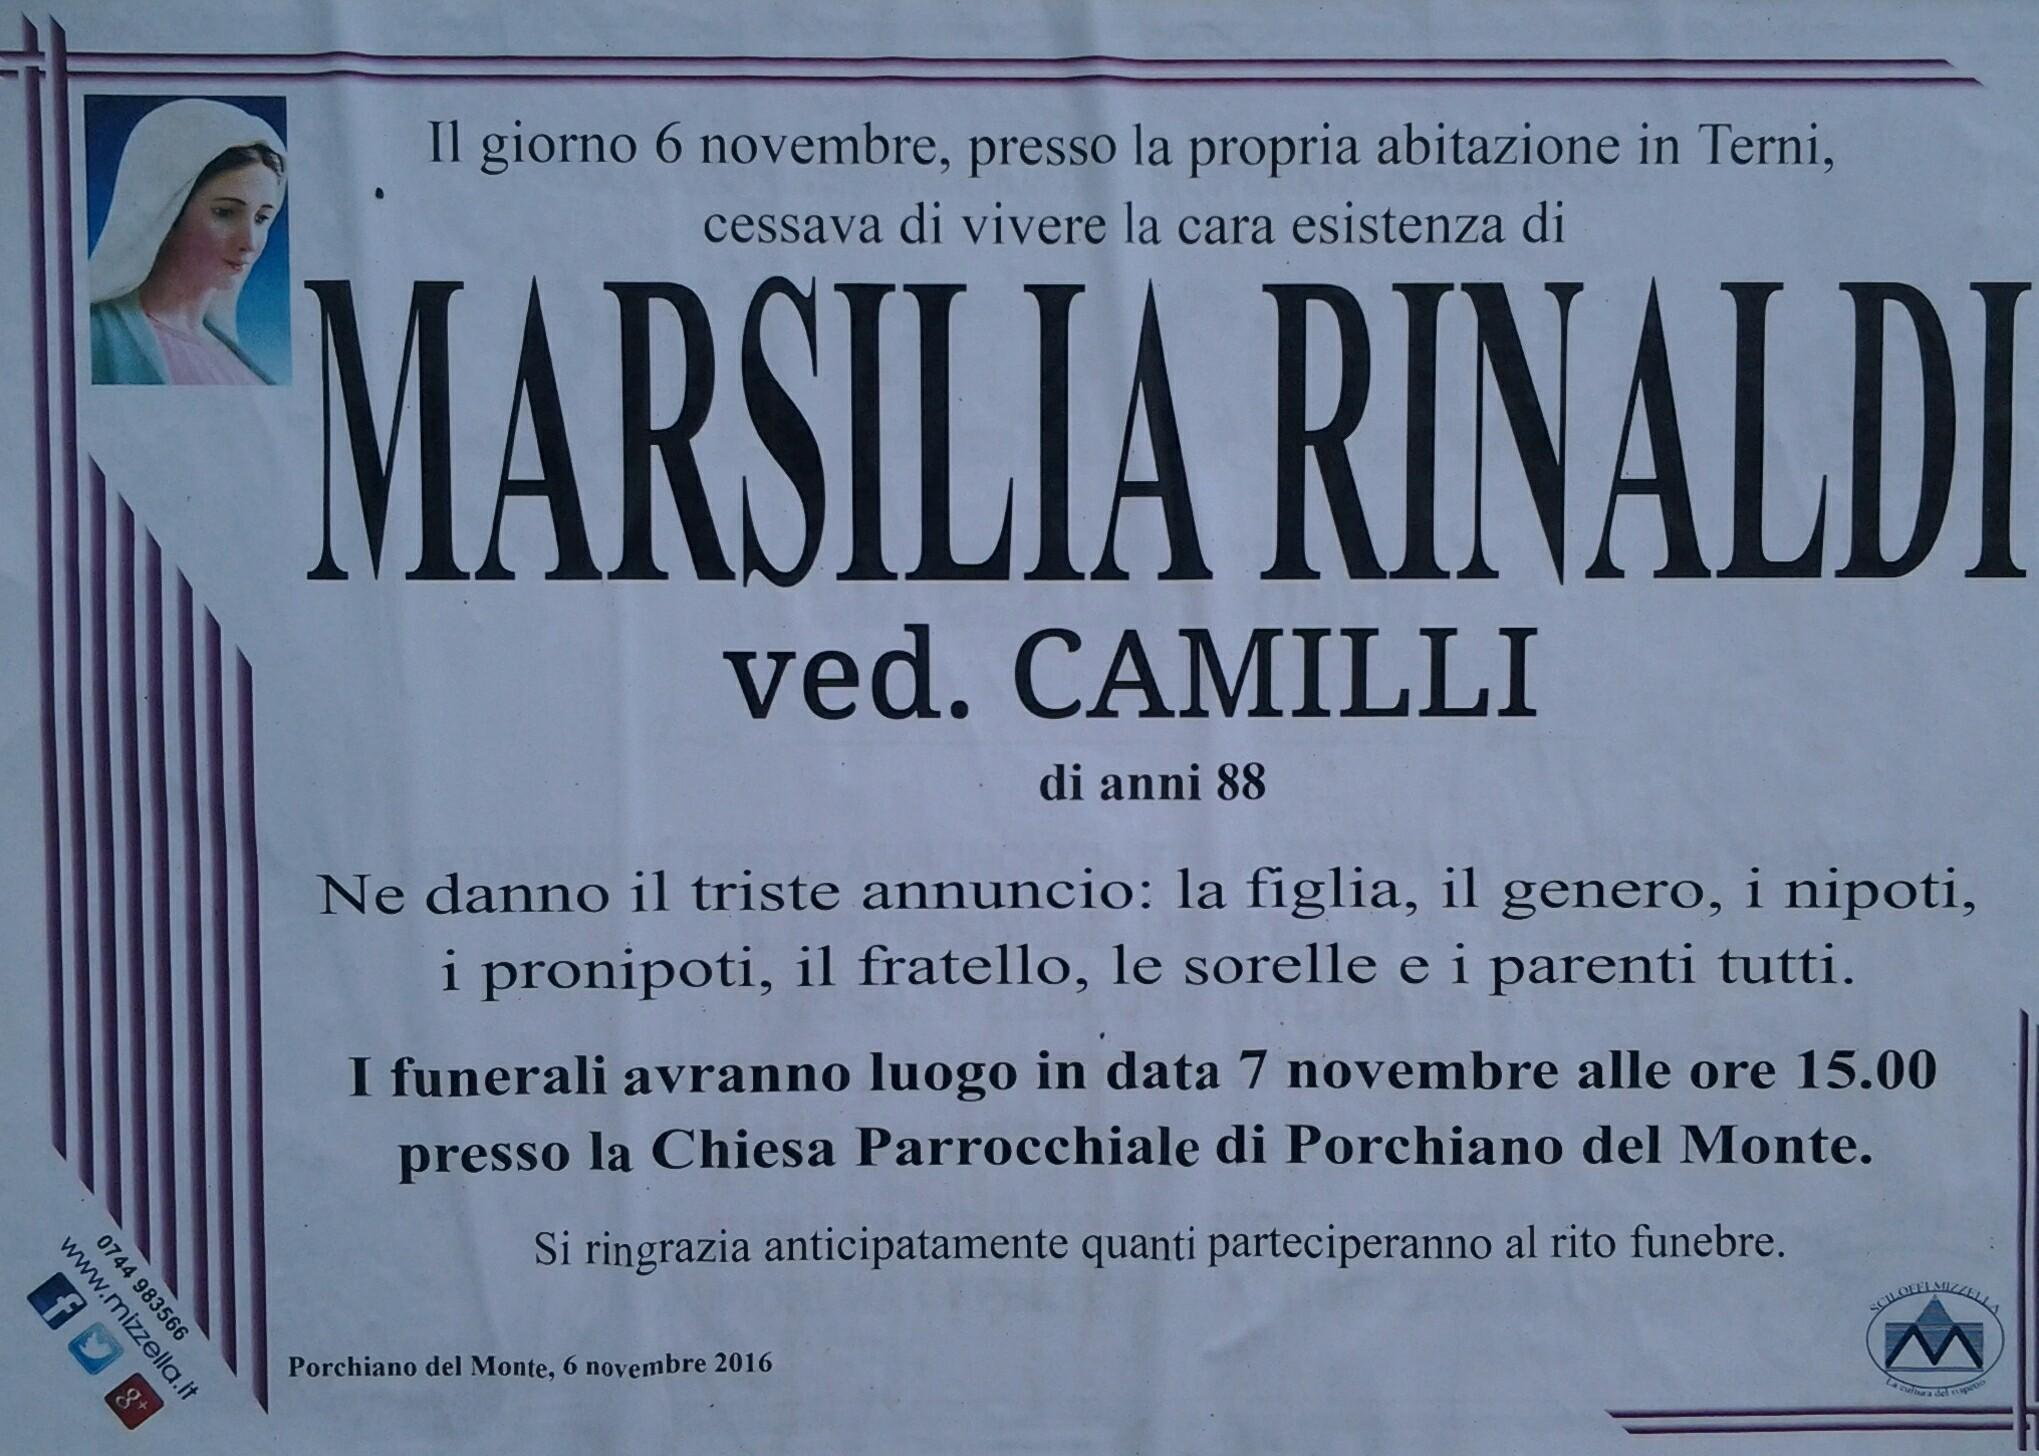 marsilia-rinaldi-vedova-camilli